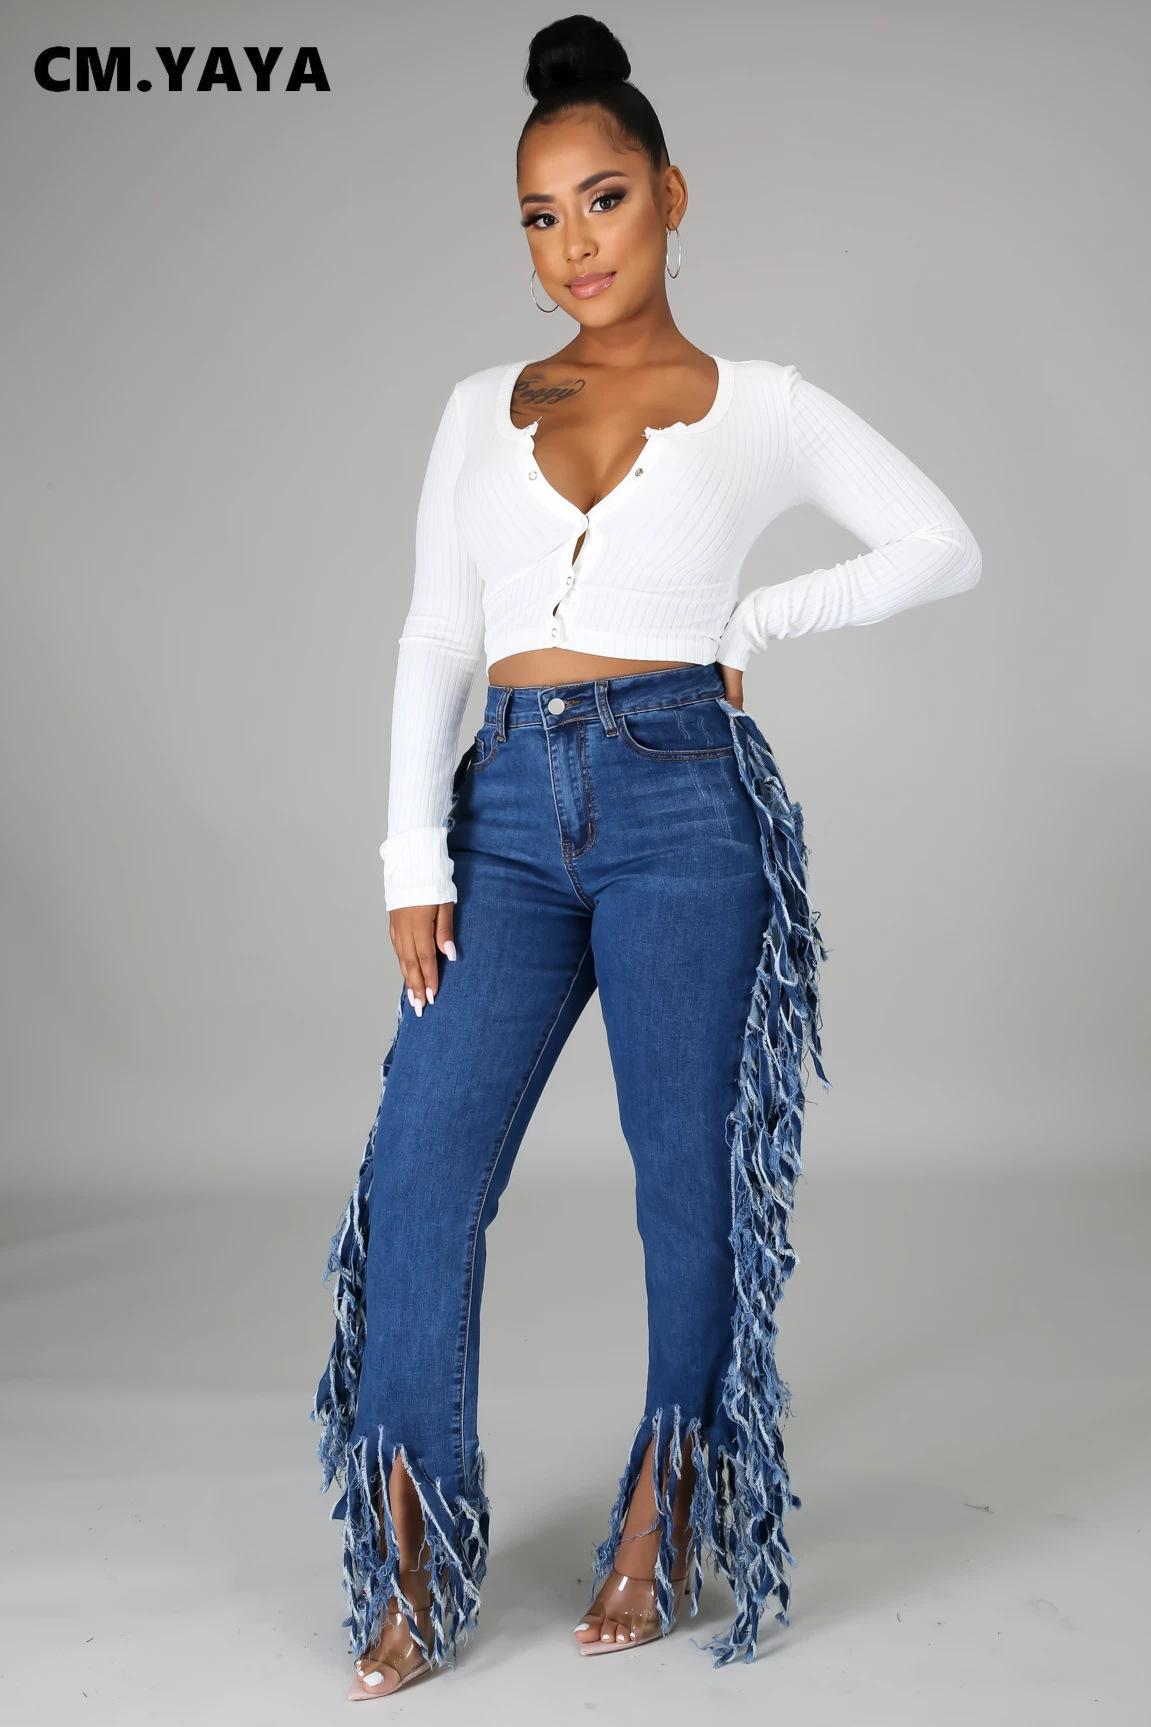 Centimetro. Yaya Kwastje Bordo Bordo Abbigliamento Denim Donne Donne Retro Jeans Jeans Streetwear High Taille Lady Broek